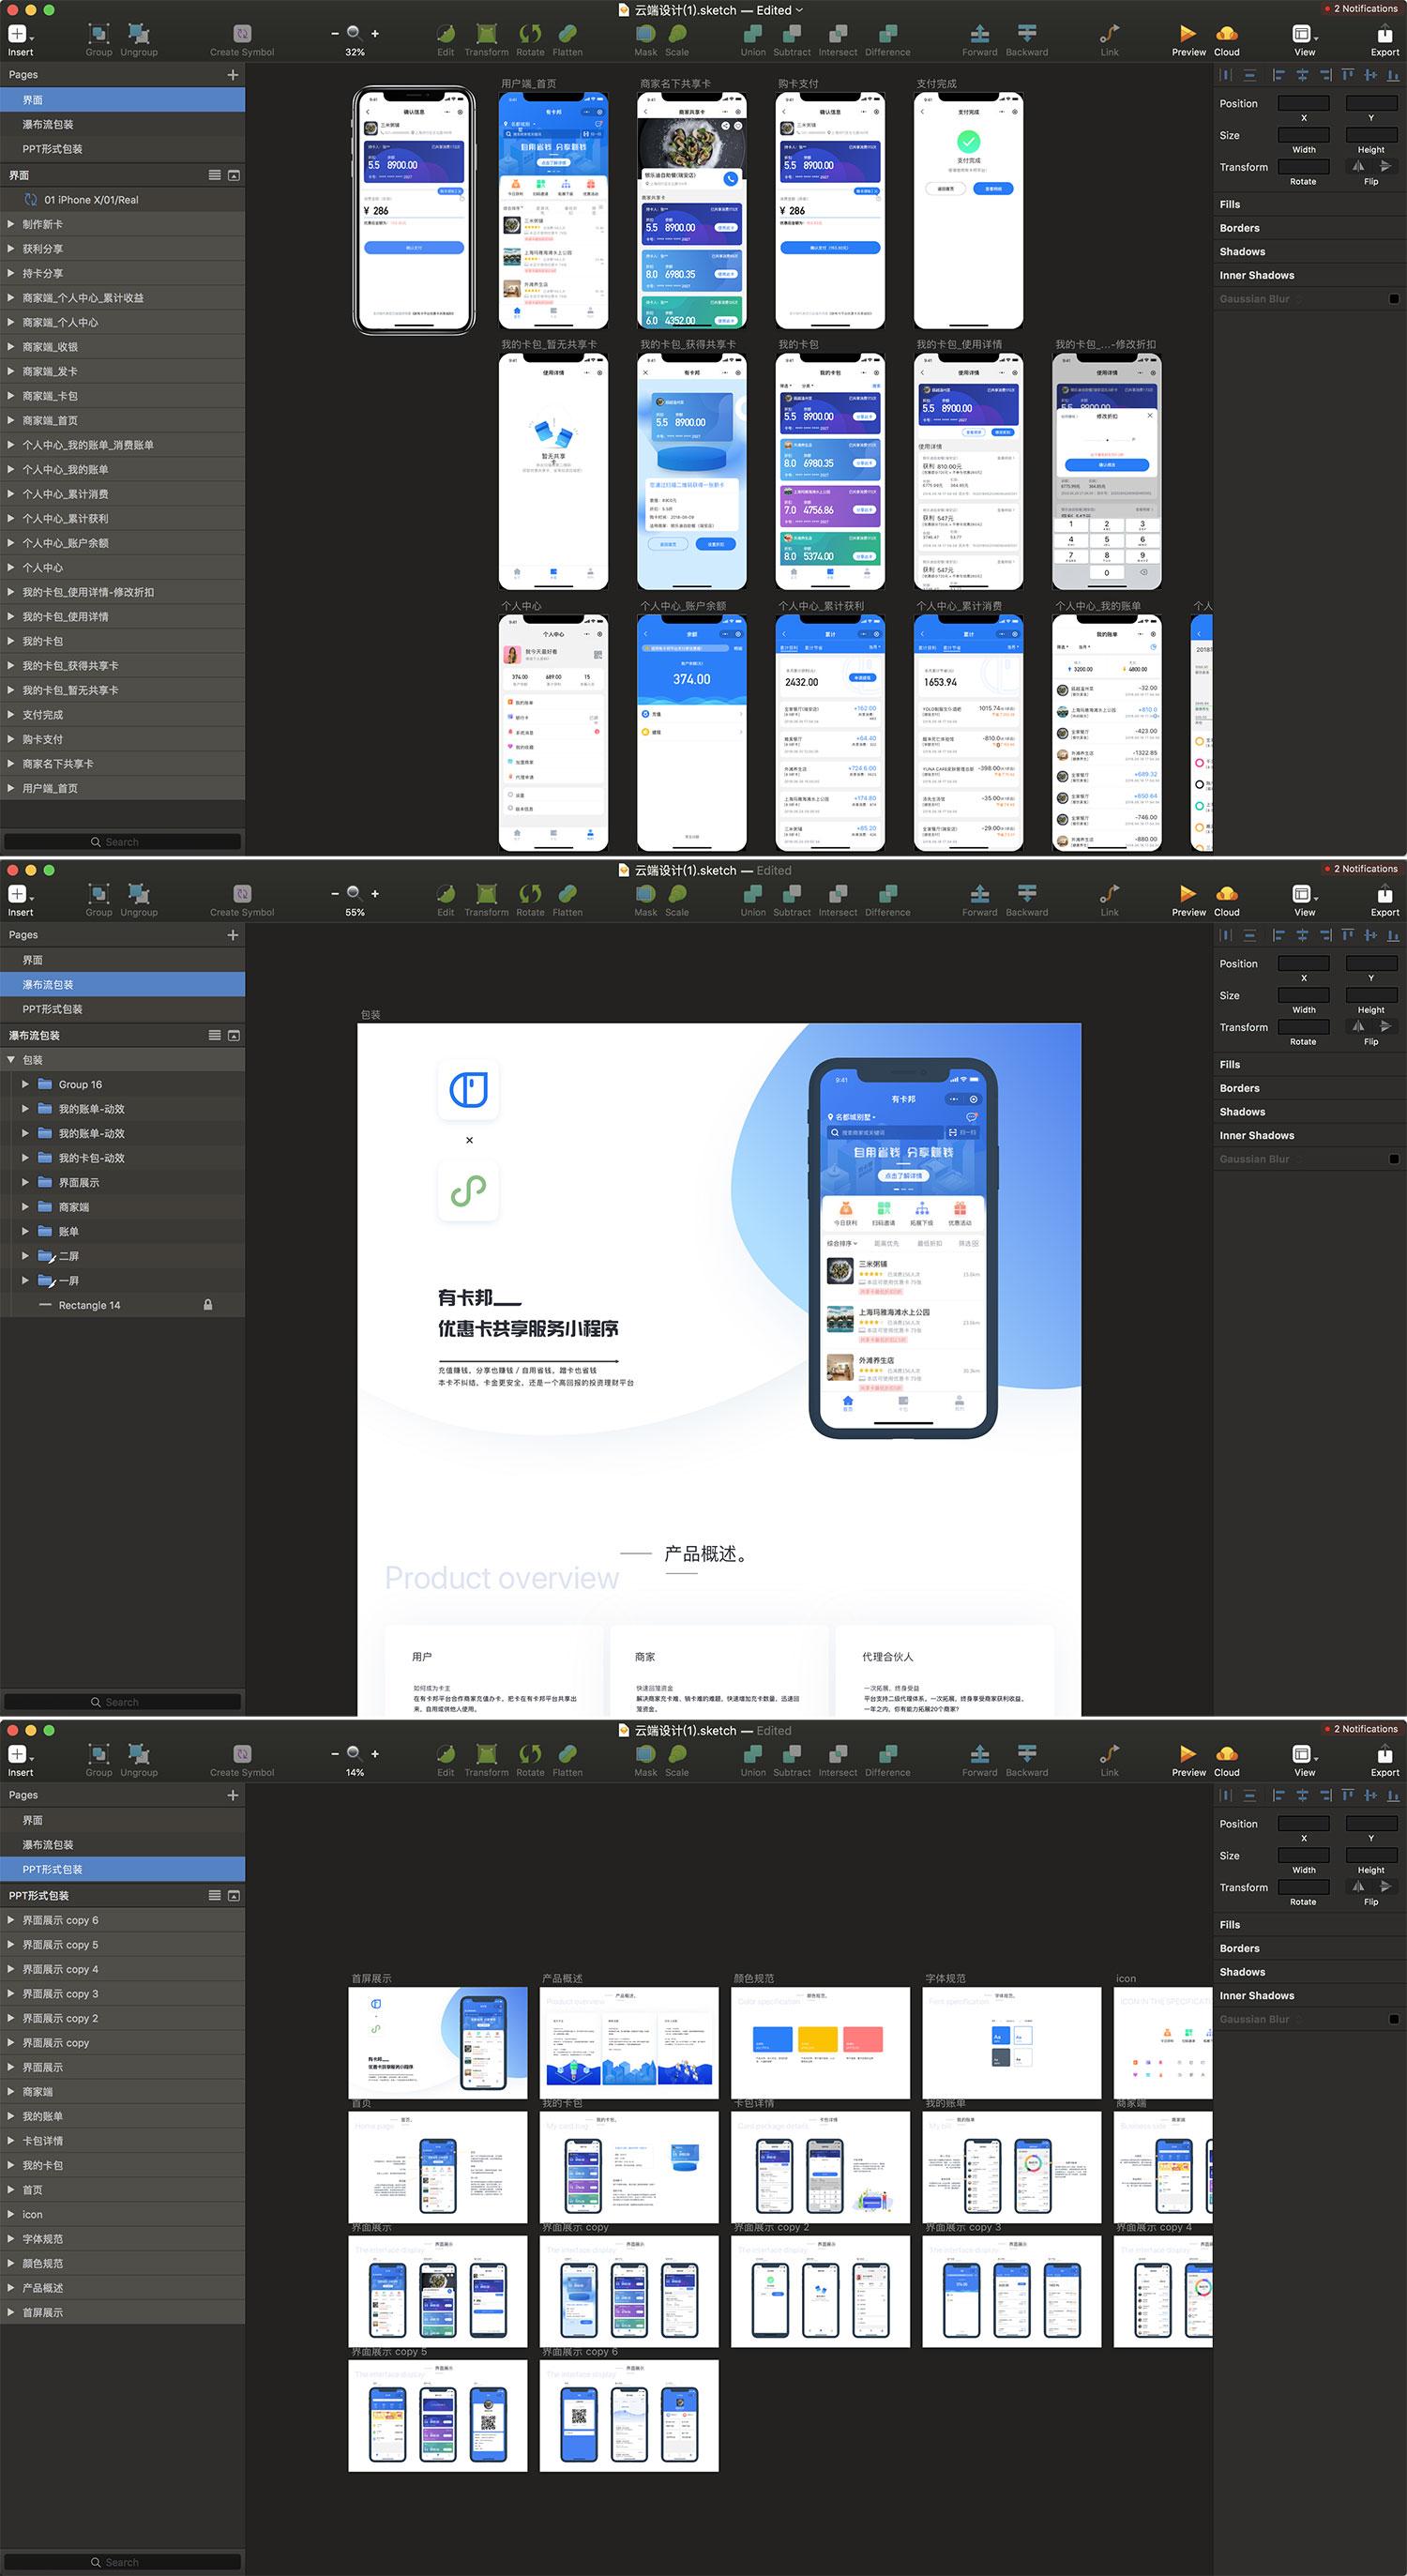 sketch打造的金融、工具类小程序界面设计(内含精美瀑布流/PPT 形式包装及 symbol 规范组件源文件)